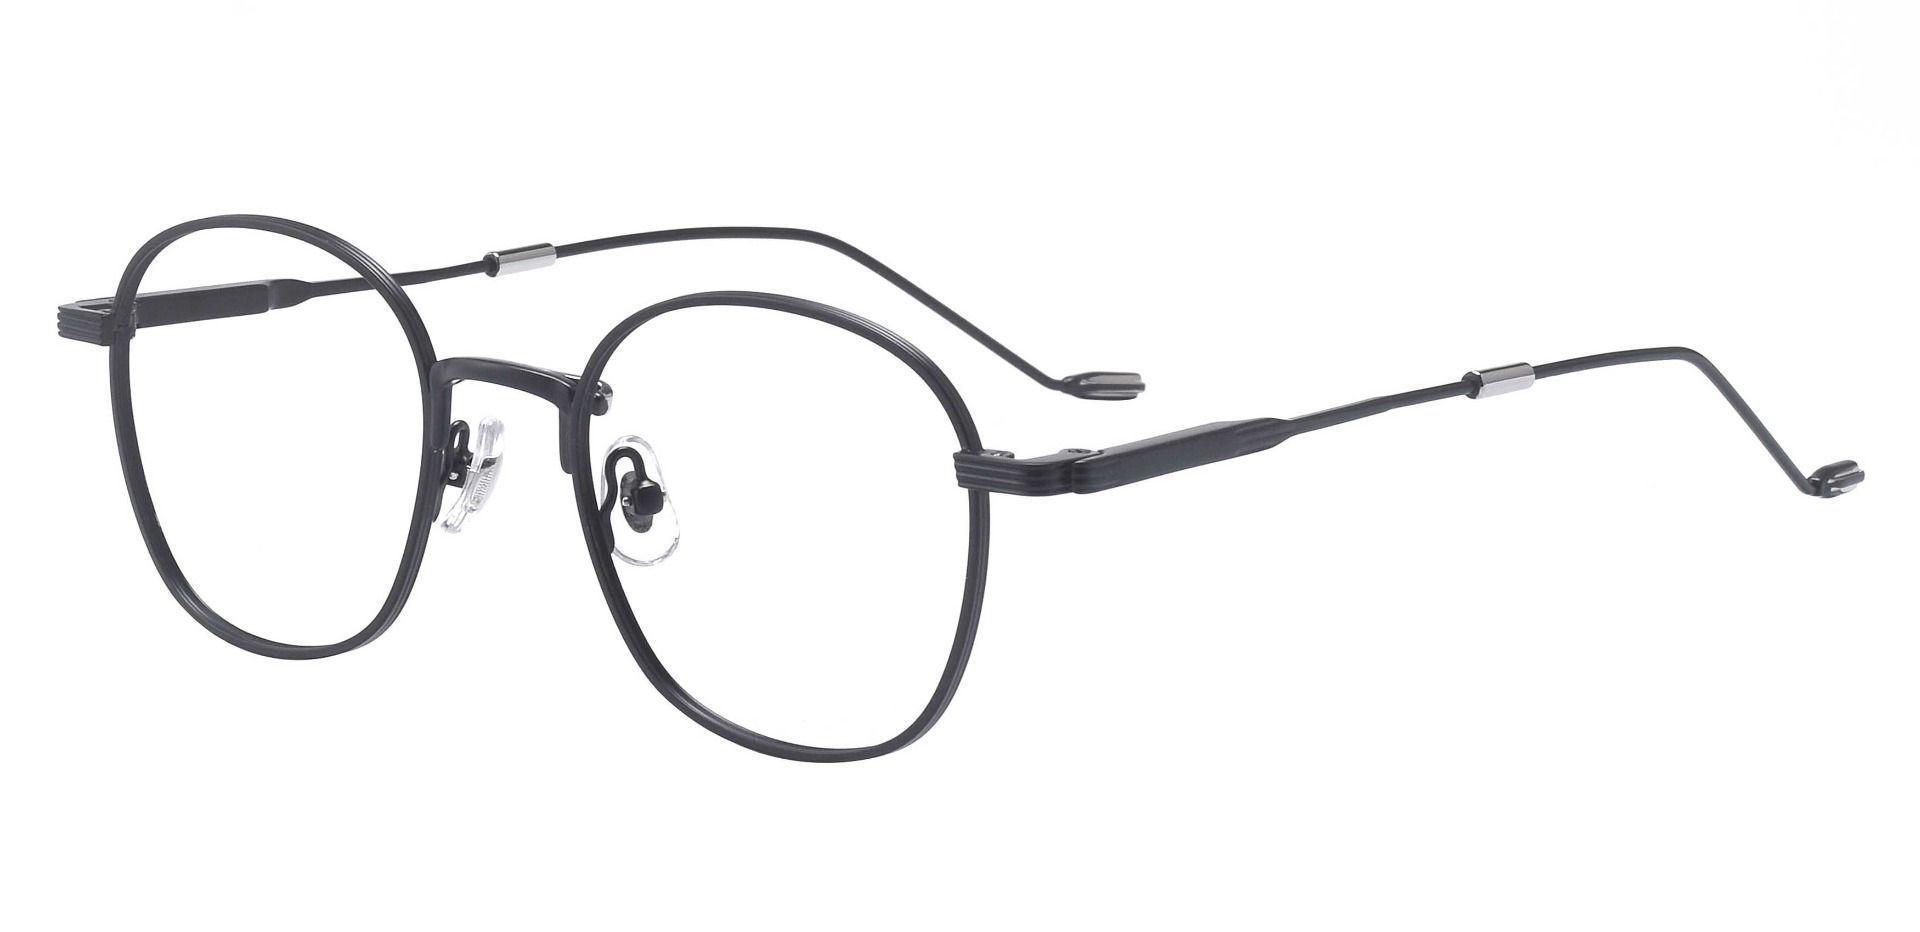 Watkins Oval Prescription Glasses - Black